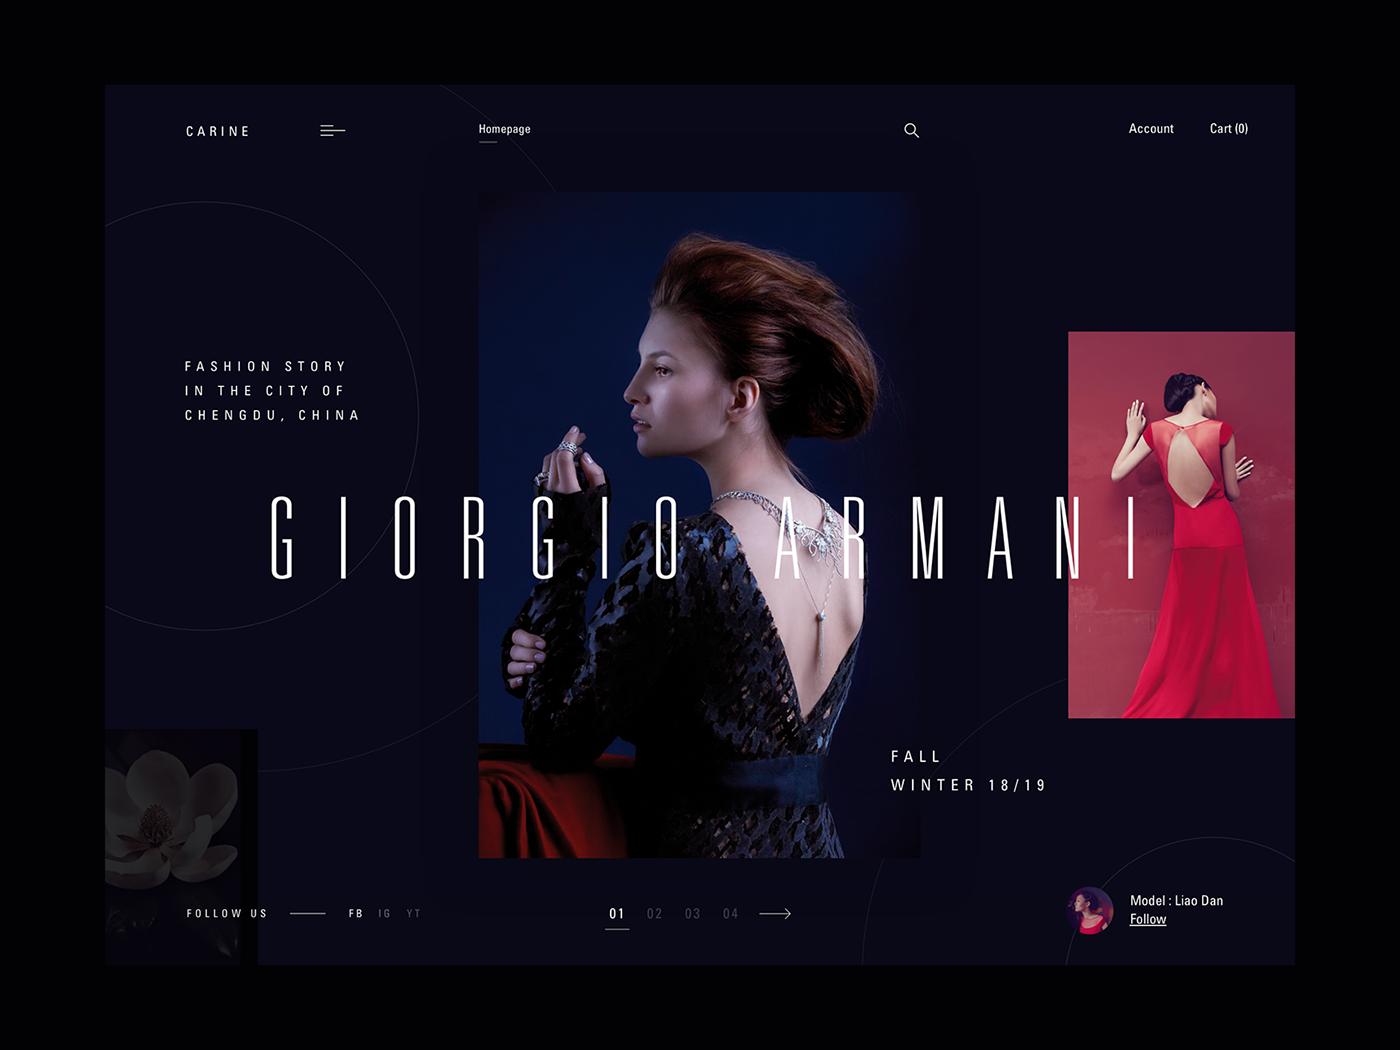 Webdesign ux UI interaction dribbble Fashion  modern typography   uidesign uxdesign